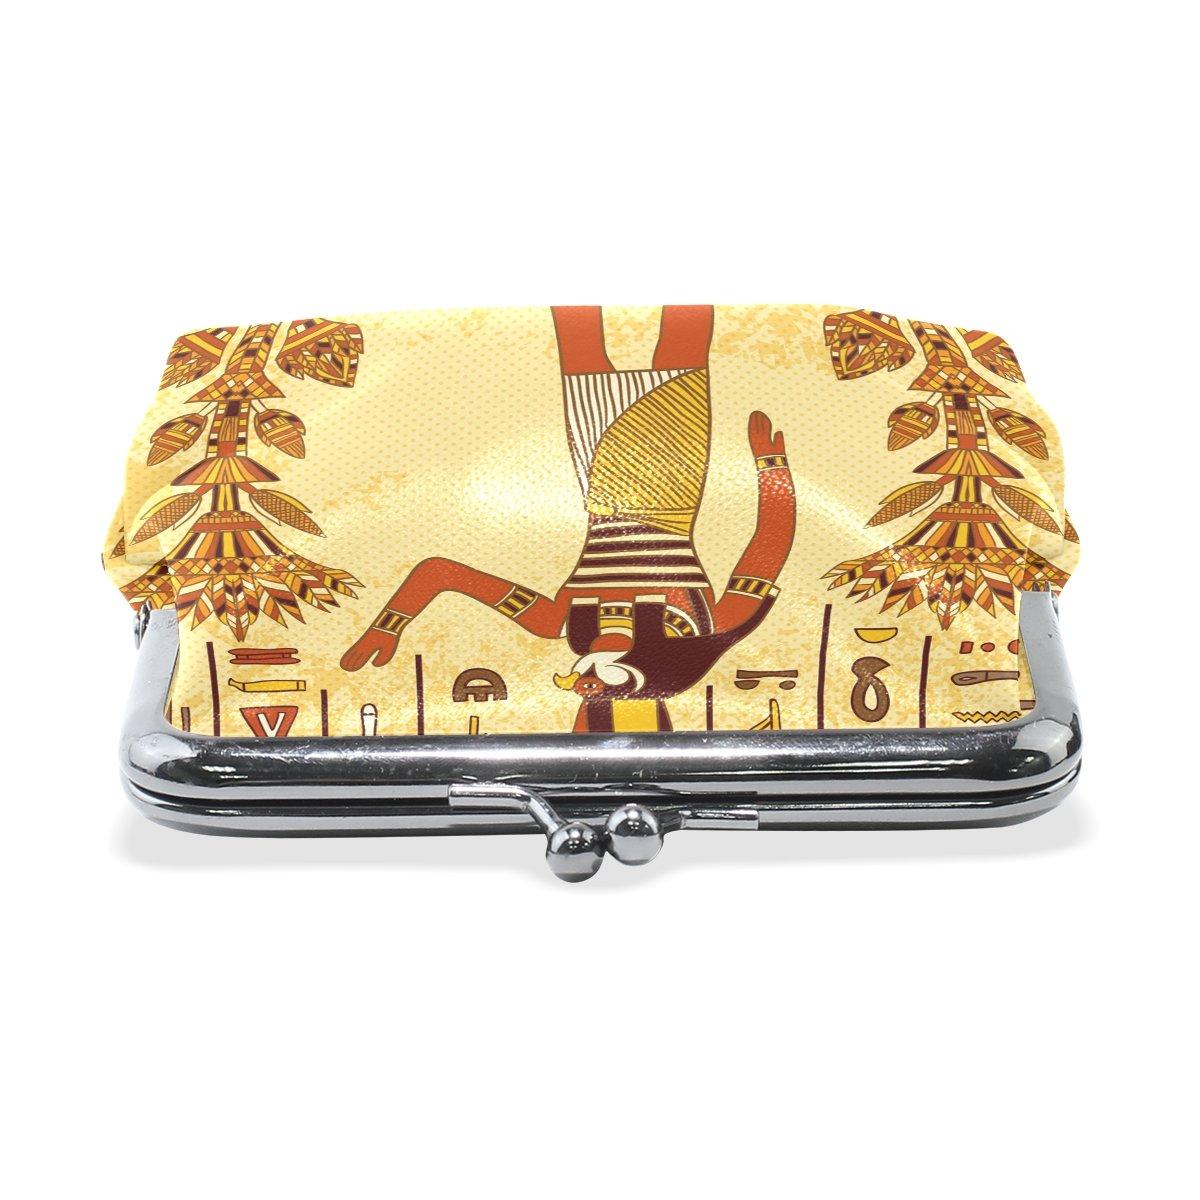 Coin Purse Egyptian Character Wallet Buckle Clutch Handbag For Women Girls Gift